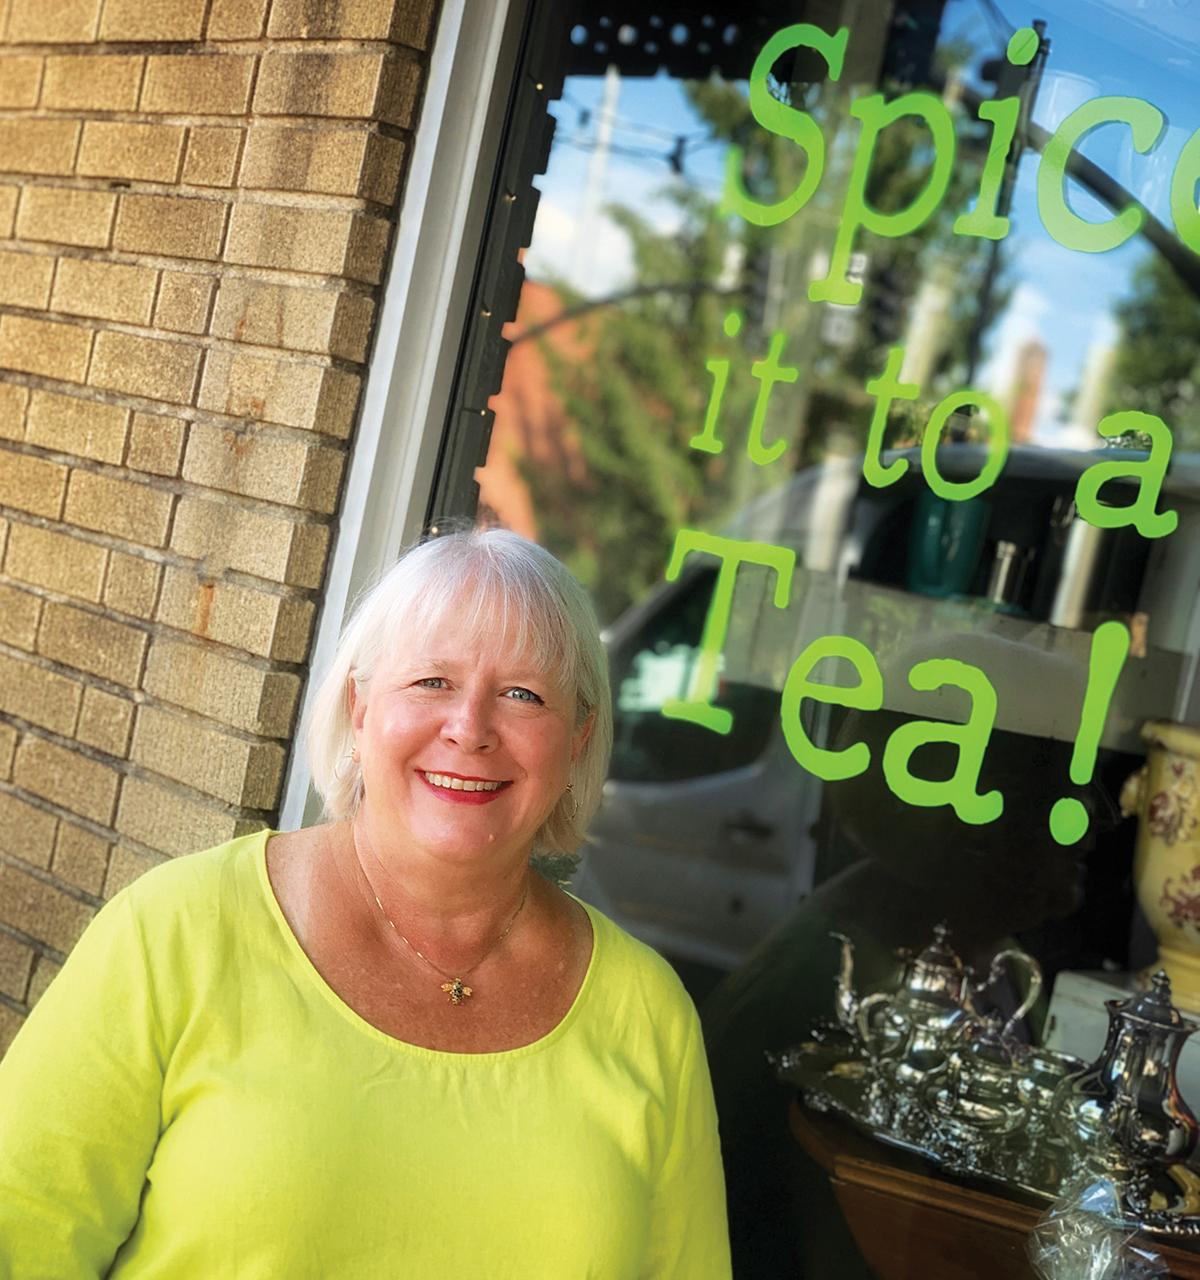 Shop Talk: Spice it to a Tea